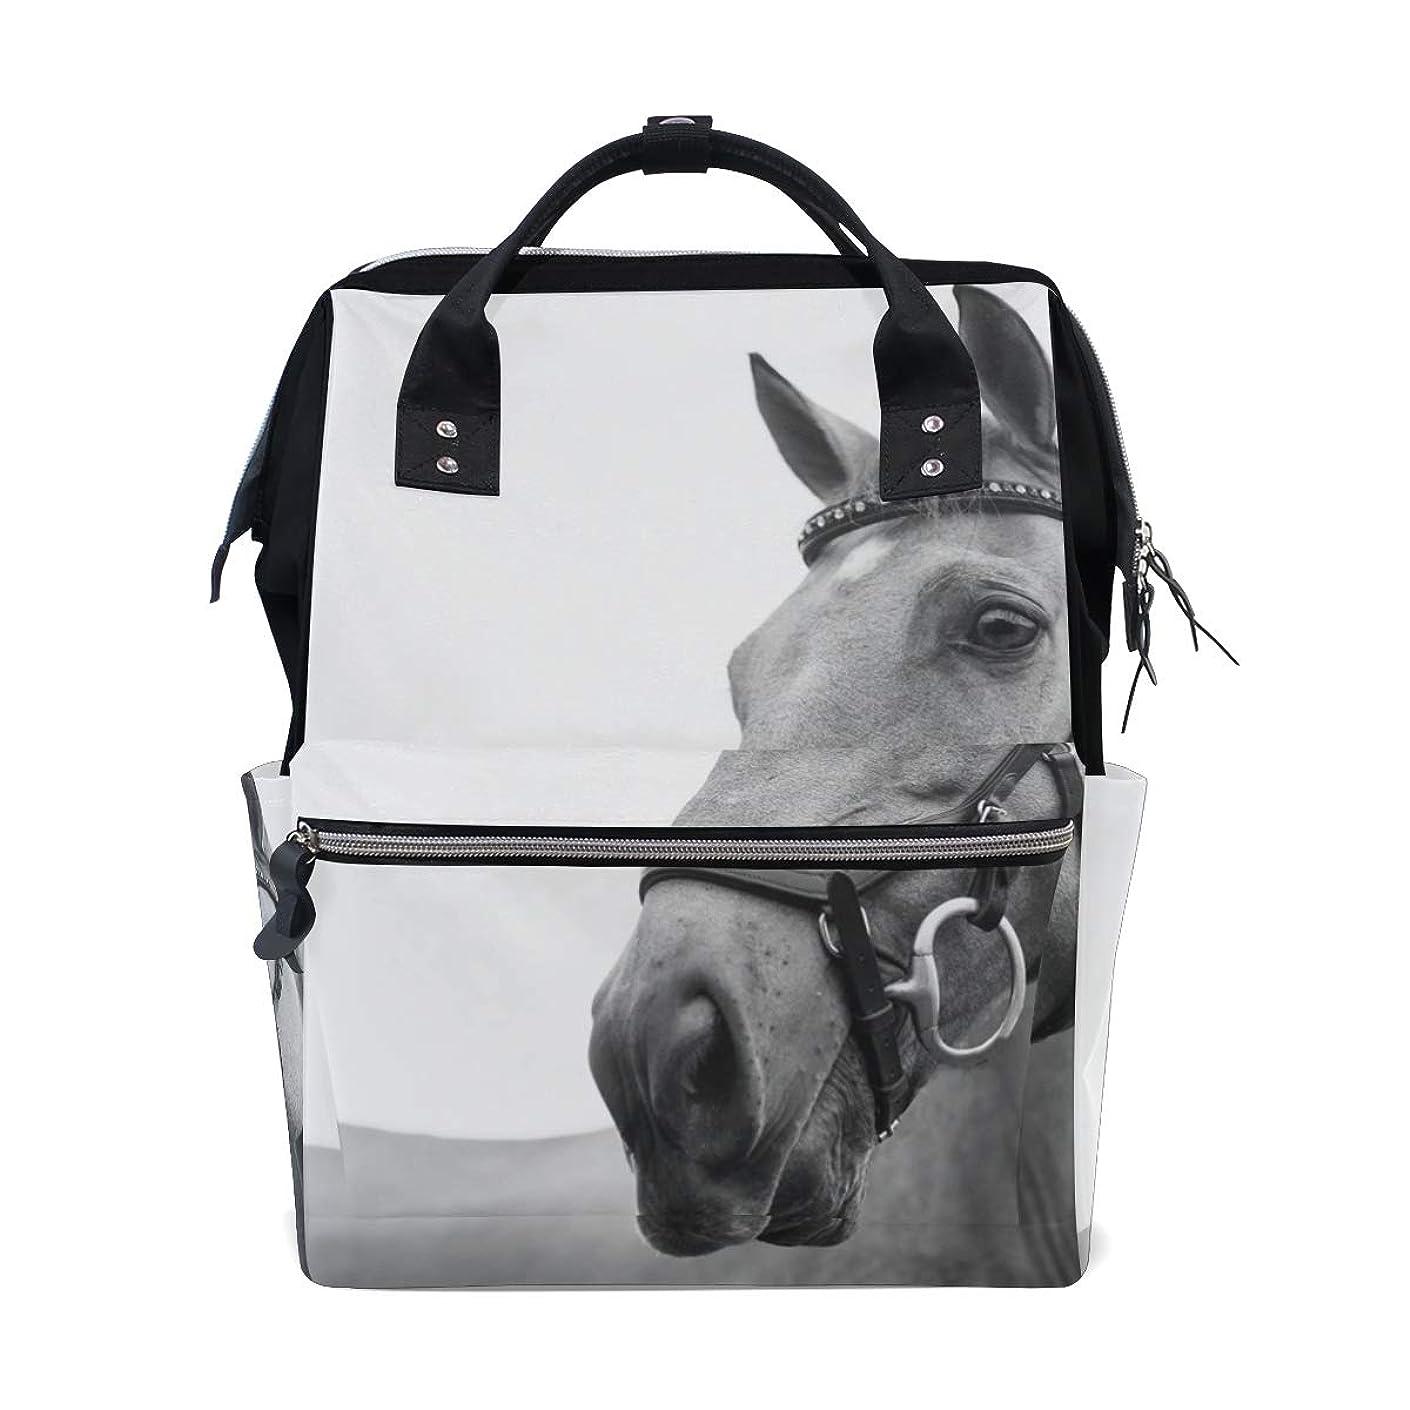 Backpack Gray Horse View School Rucksack Diaper Bags Travel Shoulder Large Capacity Bookbag for Women Men